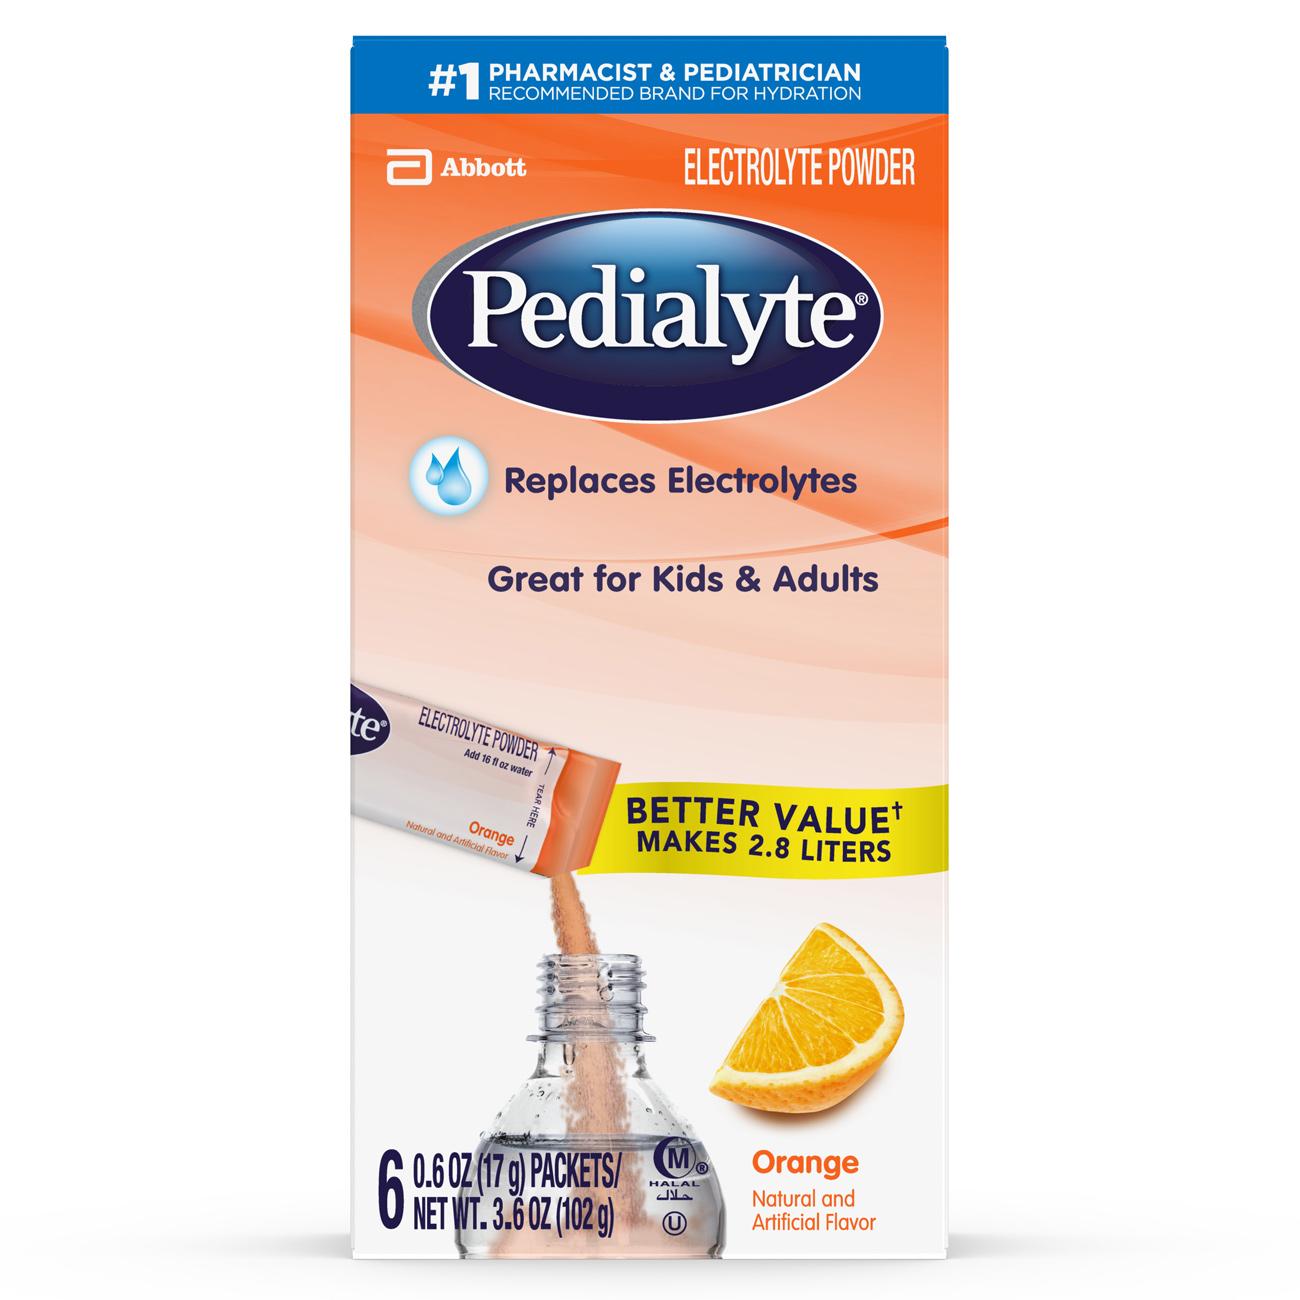 (3 pack) Pedialyte Electrolyte Powder, Electrolyte Drink, Orange, Powder Sticks, .6 oz, 6 Count